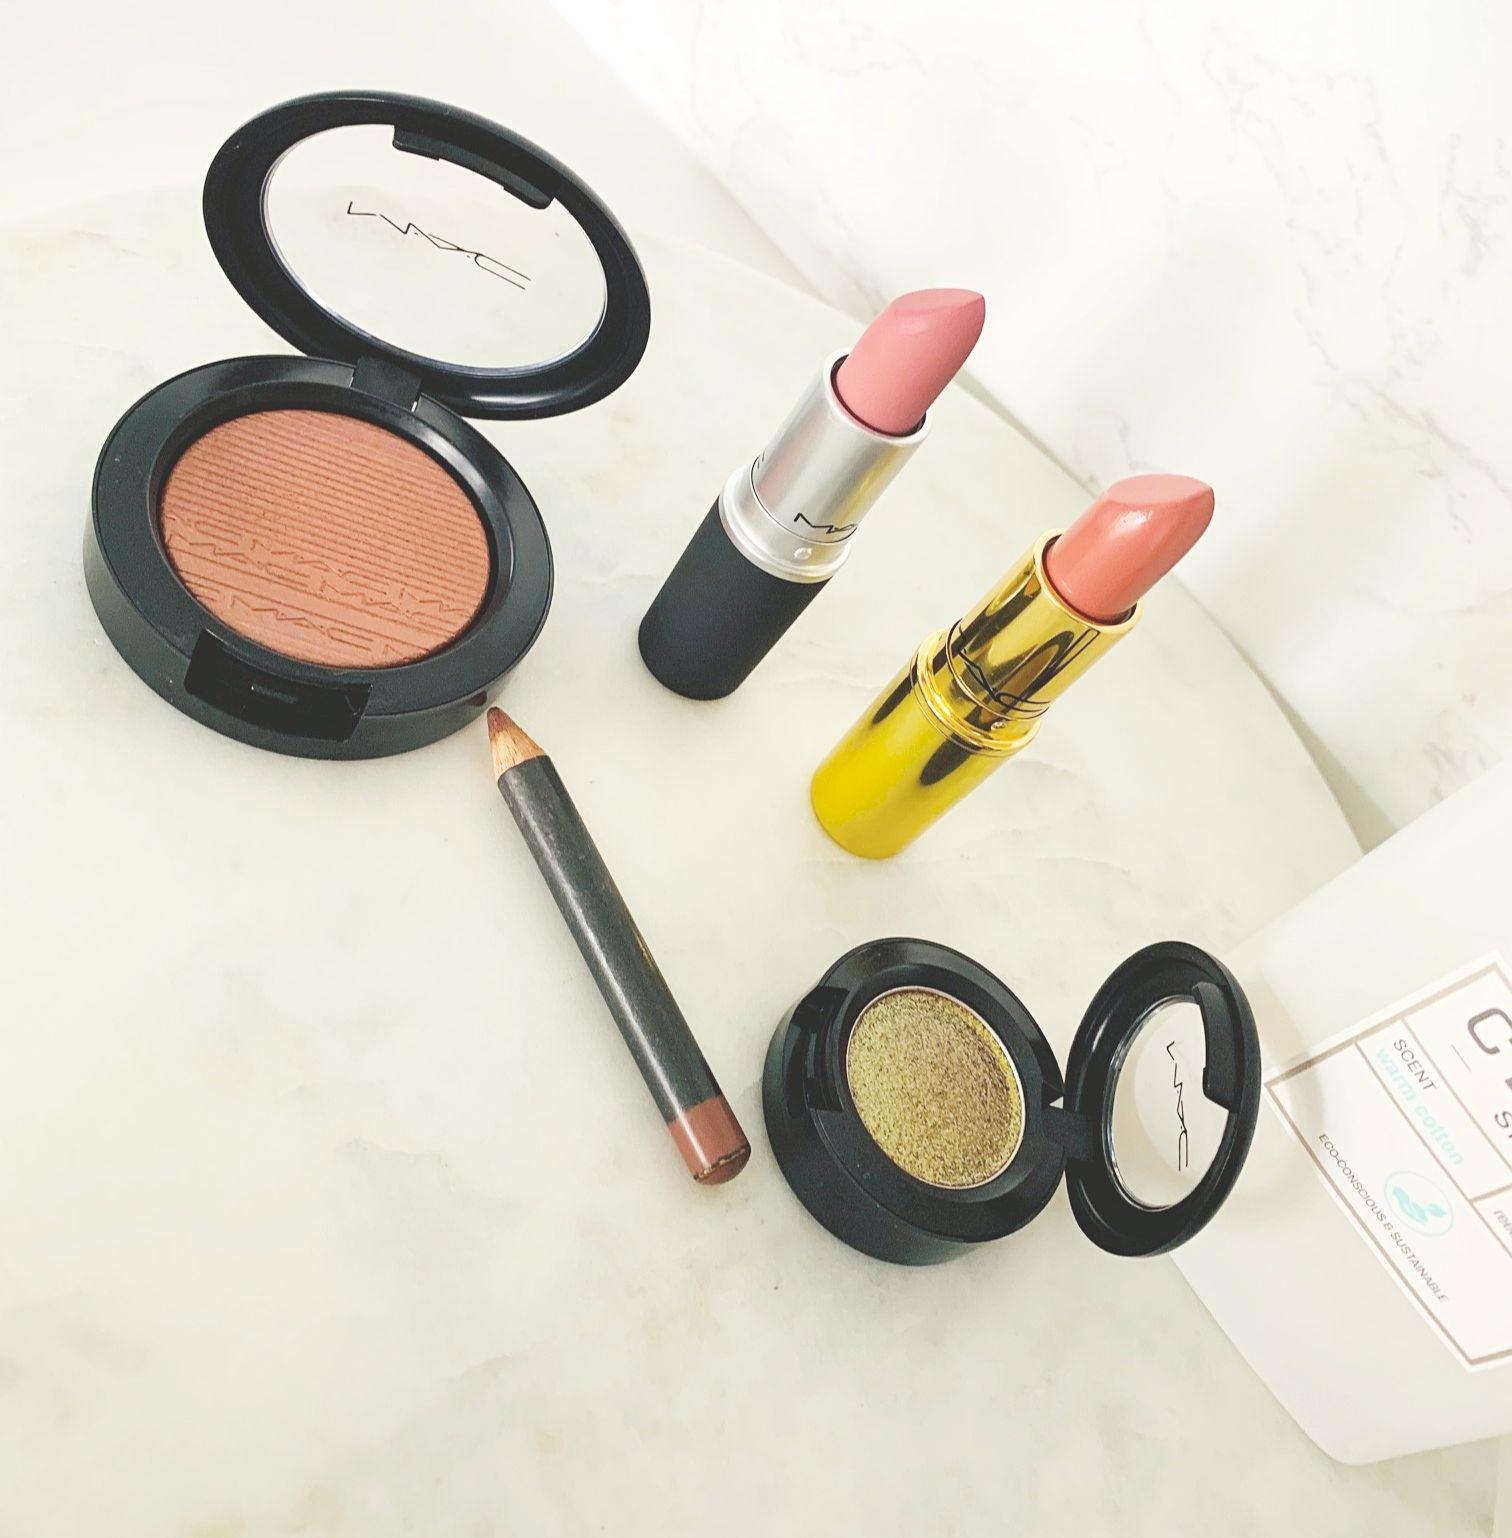 MAC x Nic Chapman, MAC Spice, MAC, MAC I Like To Watch Eyeshadow, Hushed Tone Blush. Powder Kiss Lipstick - Reverence